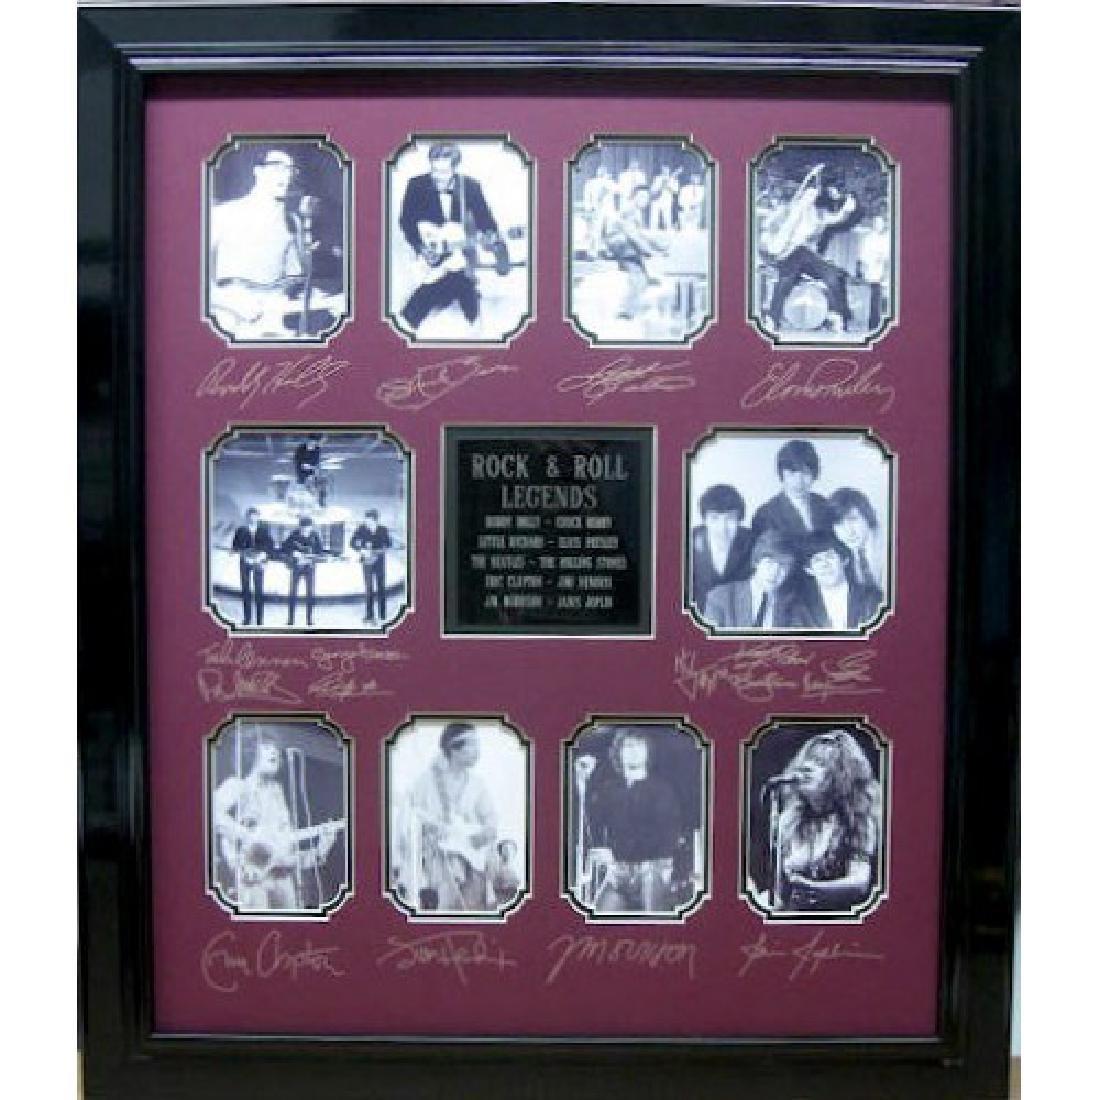 Rock & Roll Legends - Plate Signatures